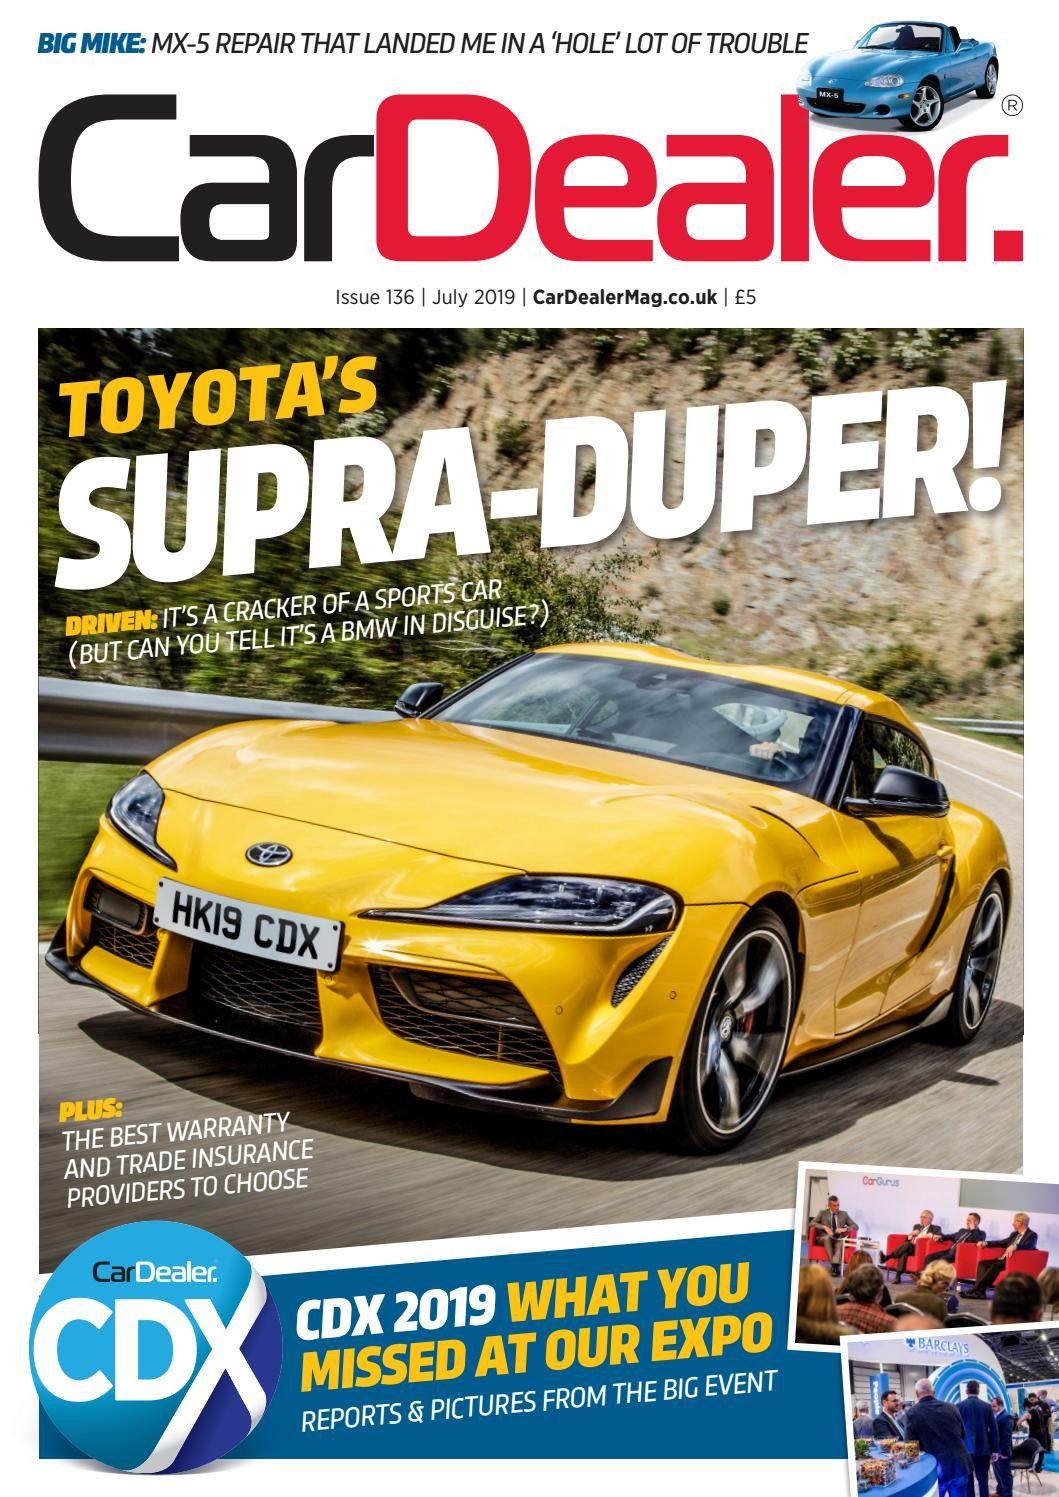 Elegant Sports Car Dealers Oxfordshire In 2020 Sports Car Car Sports